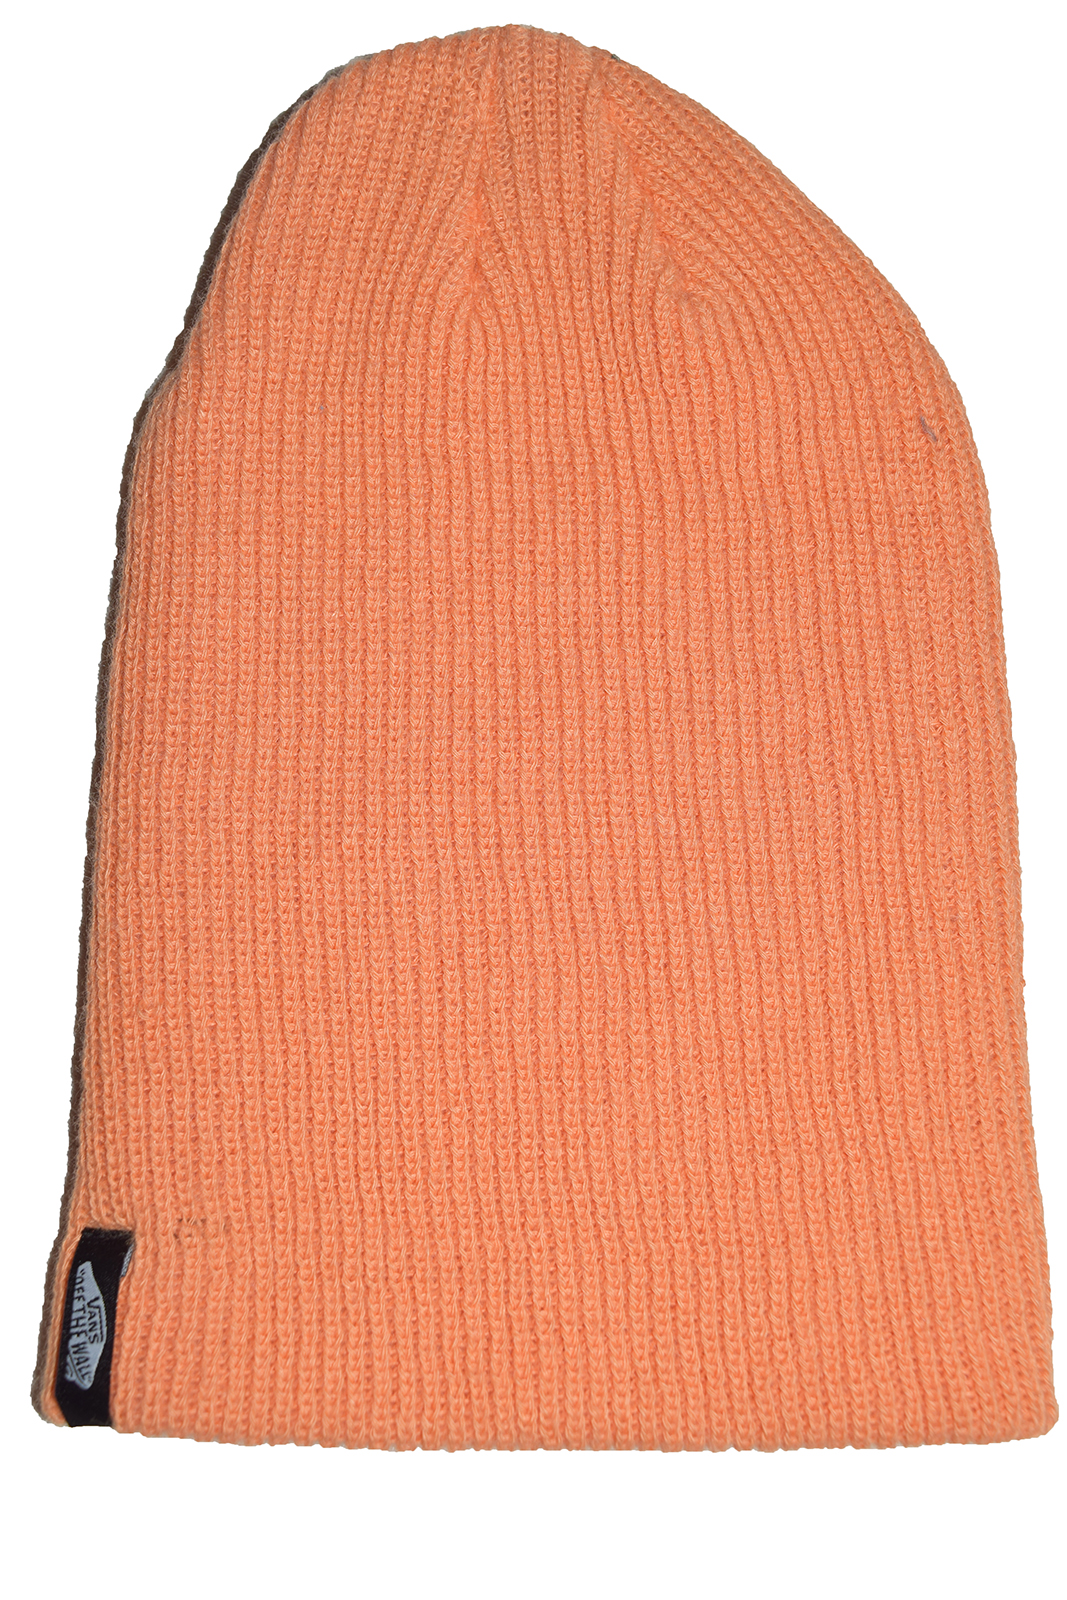 VANS off The Wall Mismoedig Beanie Orange Cuff Hat Cap 100 Acrylic ... 88e3feab795